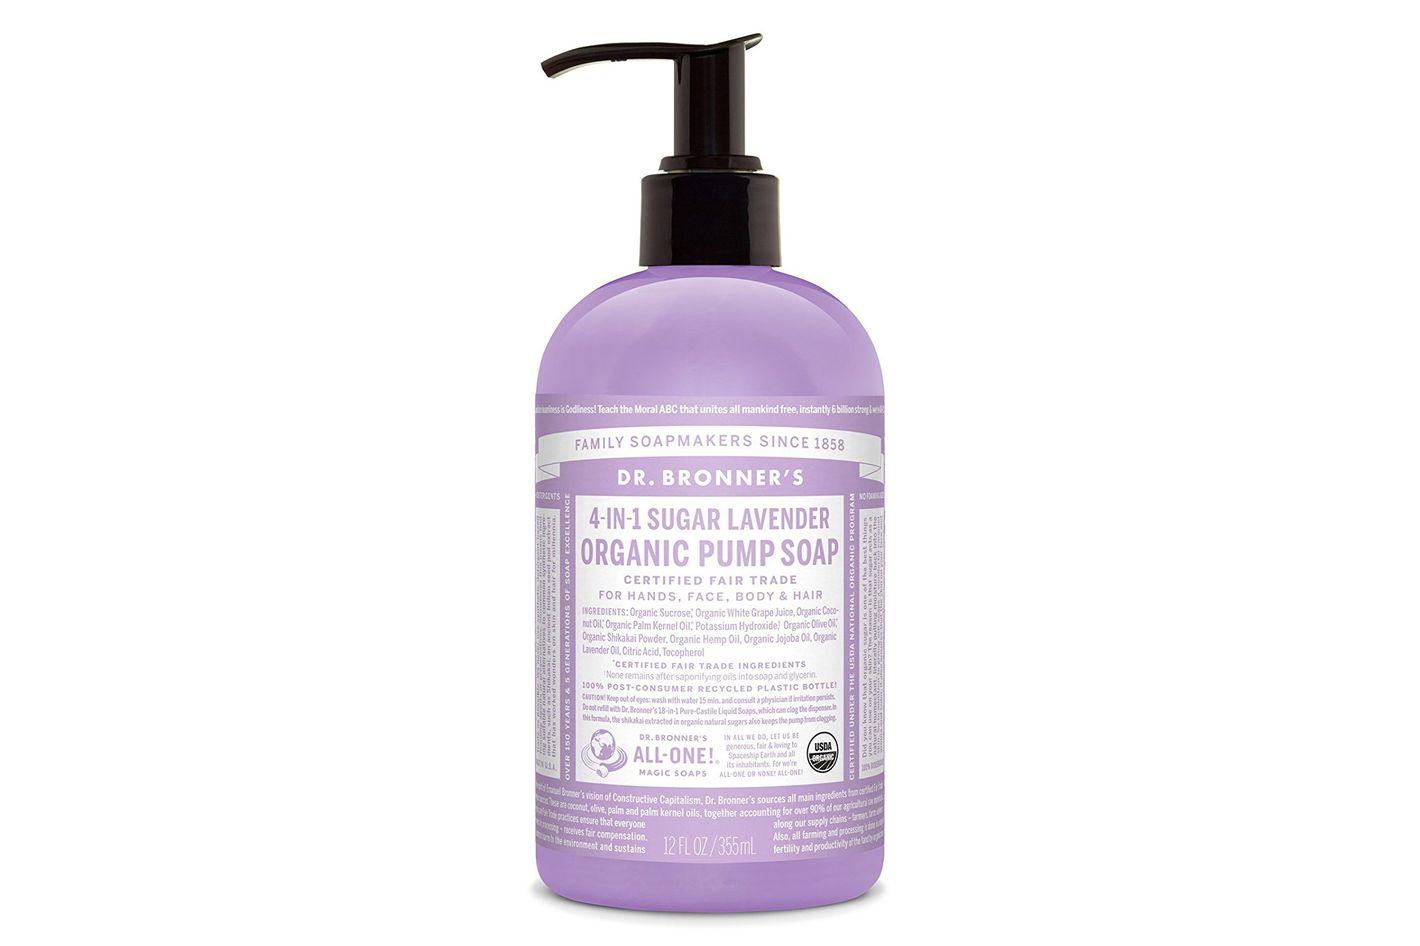 Dr. Bronner's Lavender Hand Soap